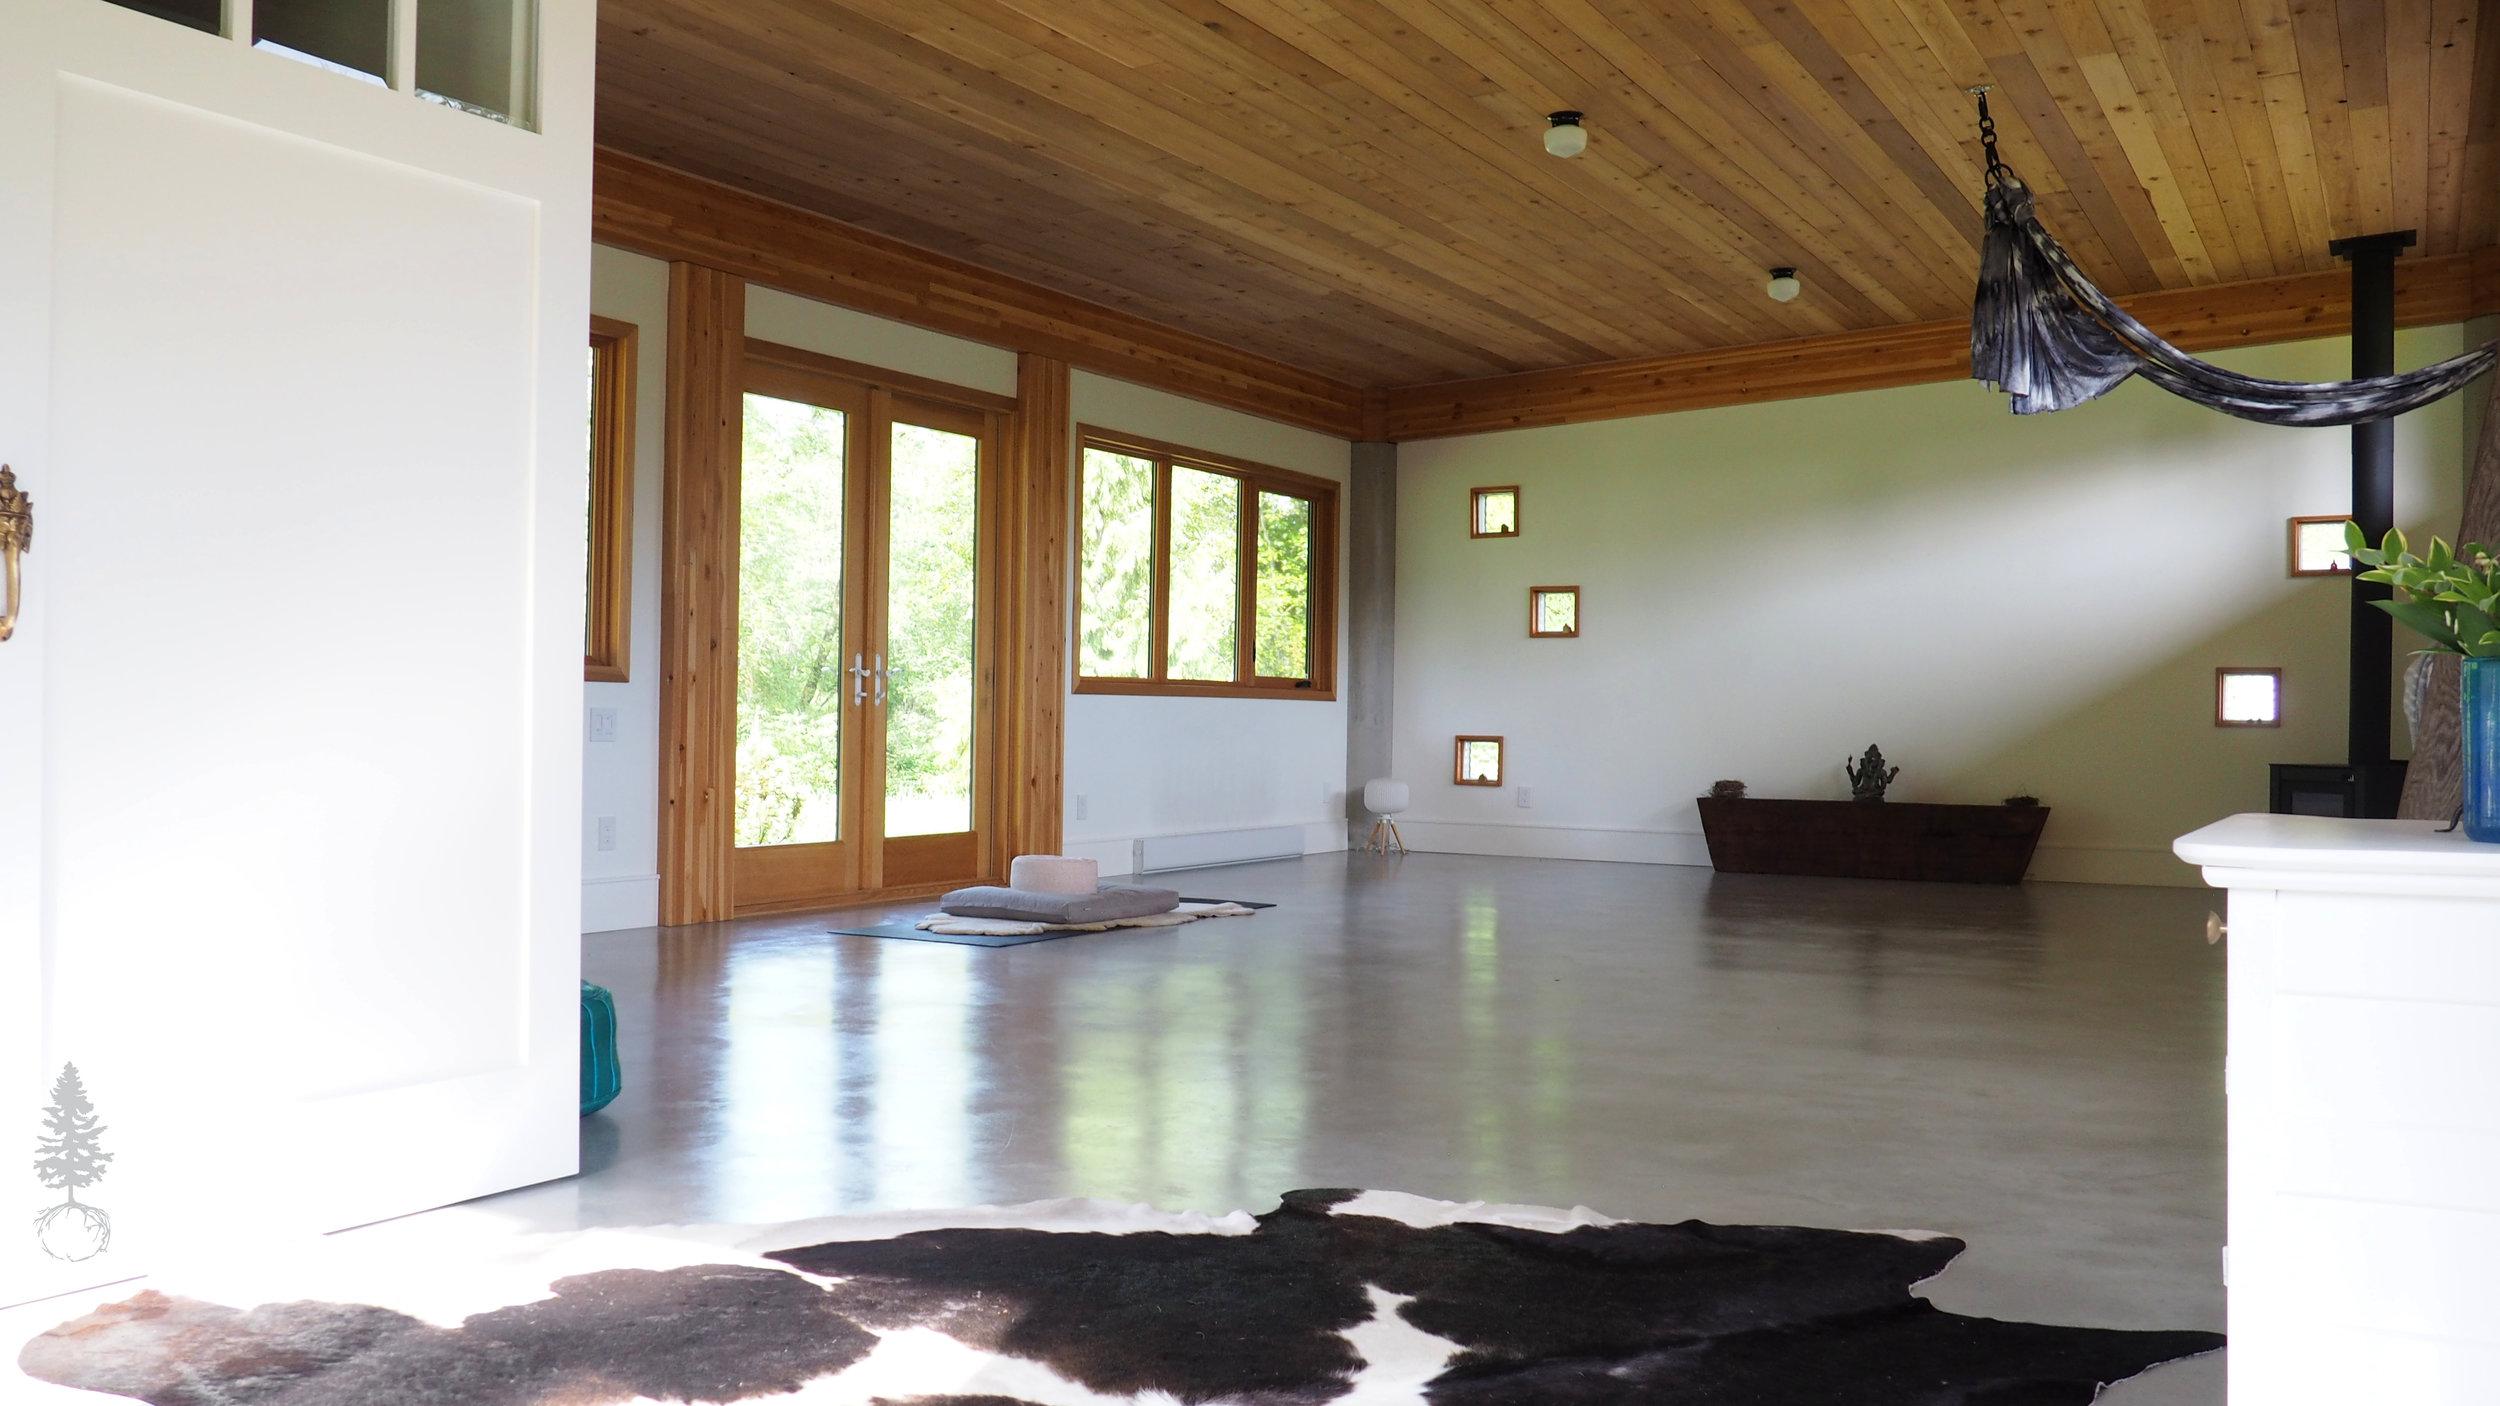 1 studio interior 2019.jpg